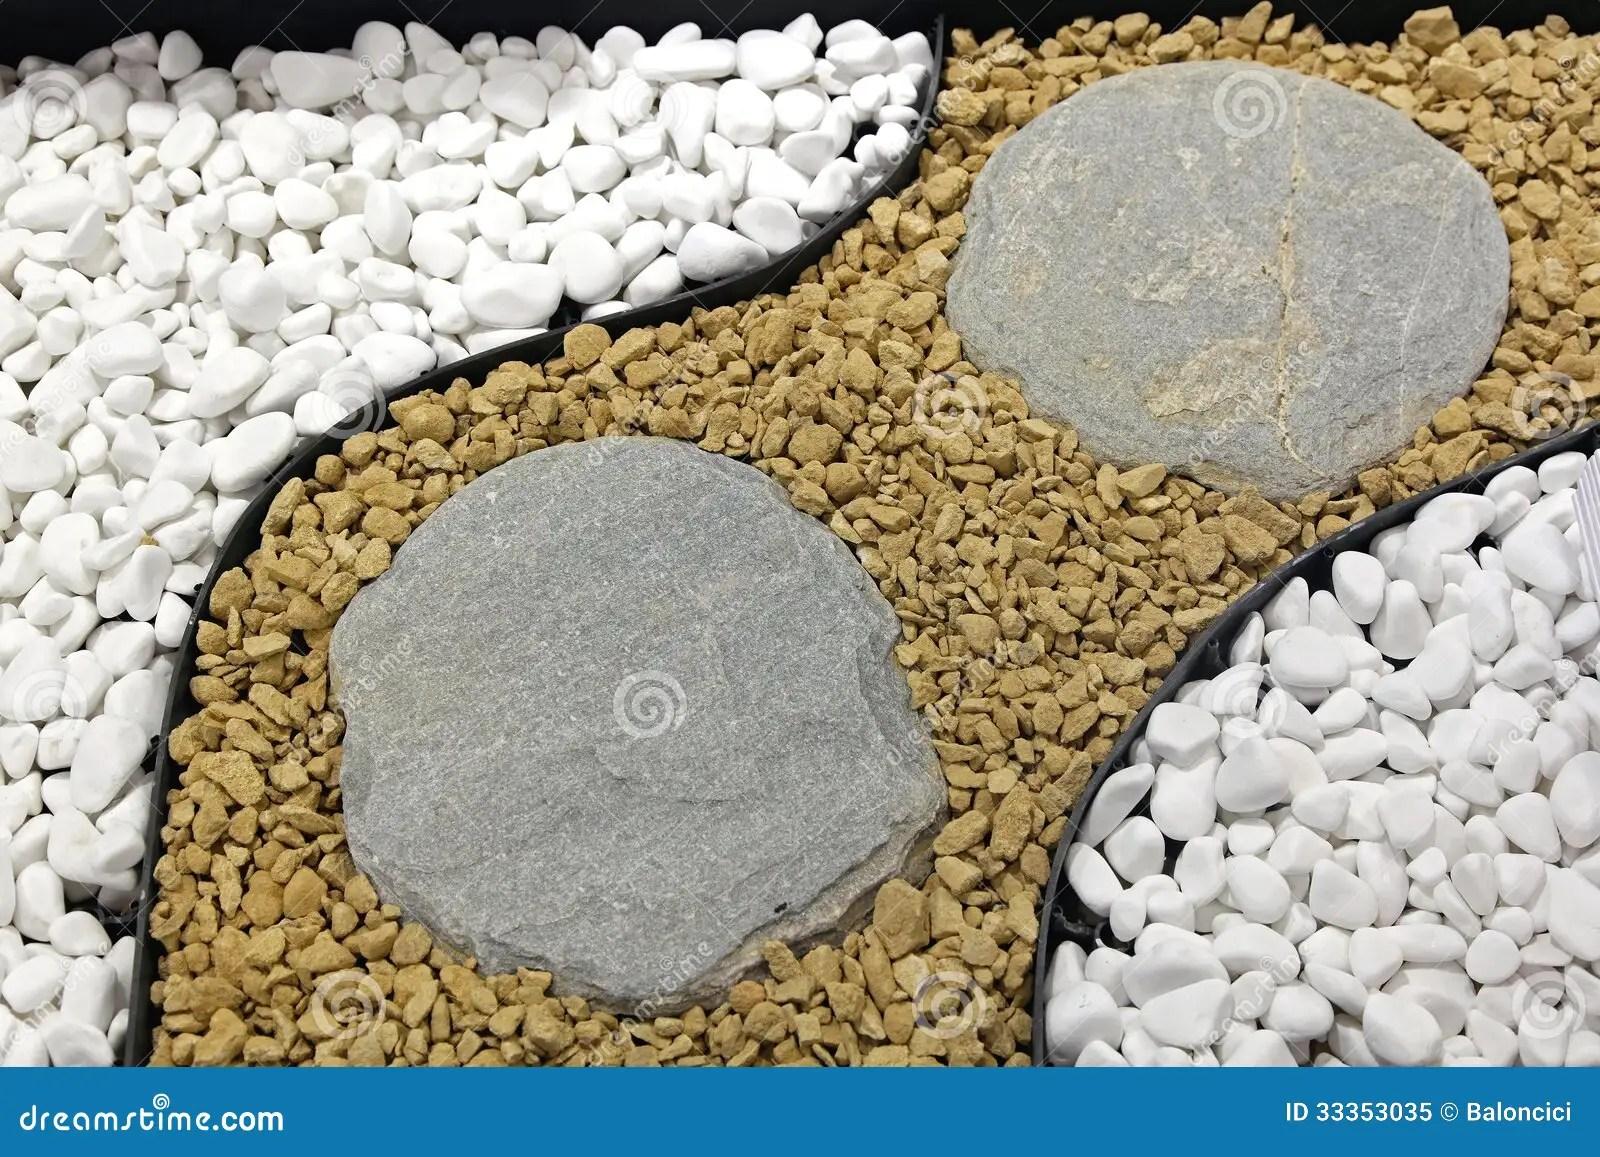 Garden Stones Pebbles Decorative